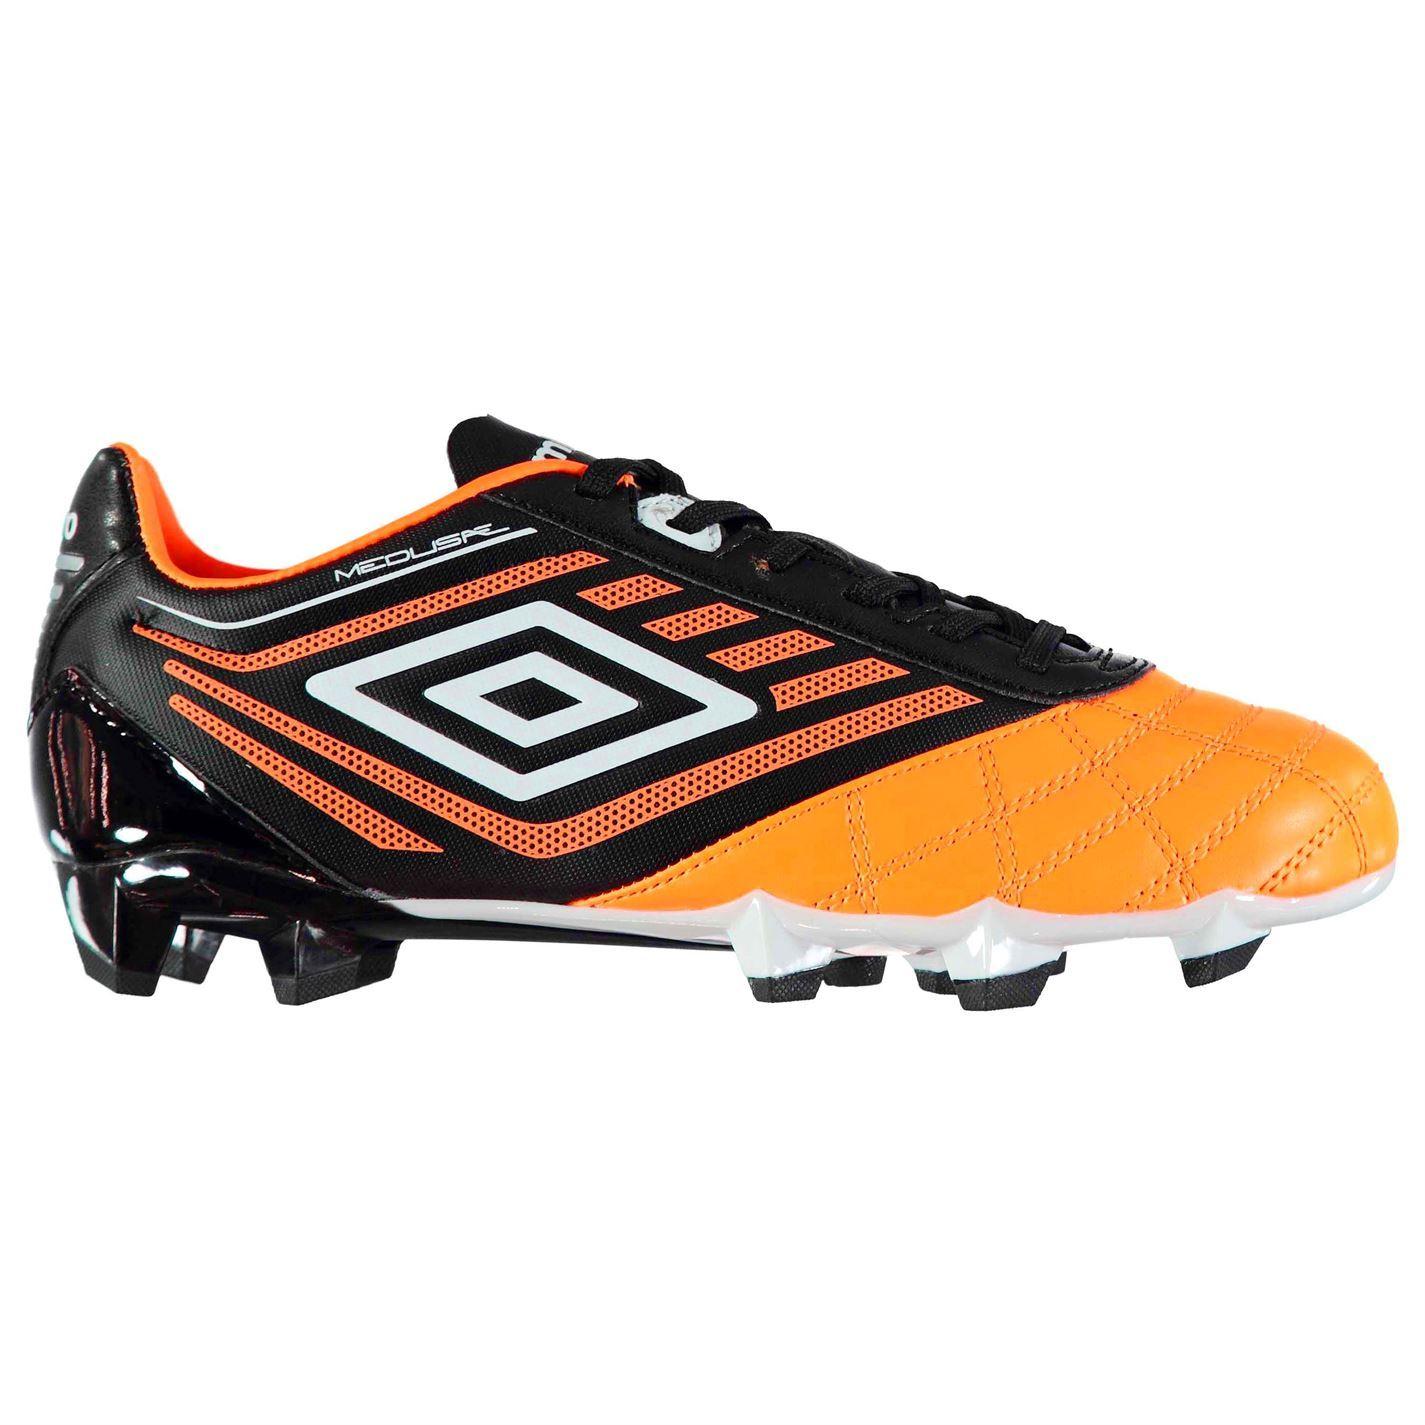 ... Umbro Medus Club FG Firm Ground Football Boots Mens Or Blk Soccer  Cleats Shoes ... 707b13e8b7